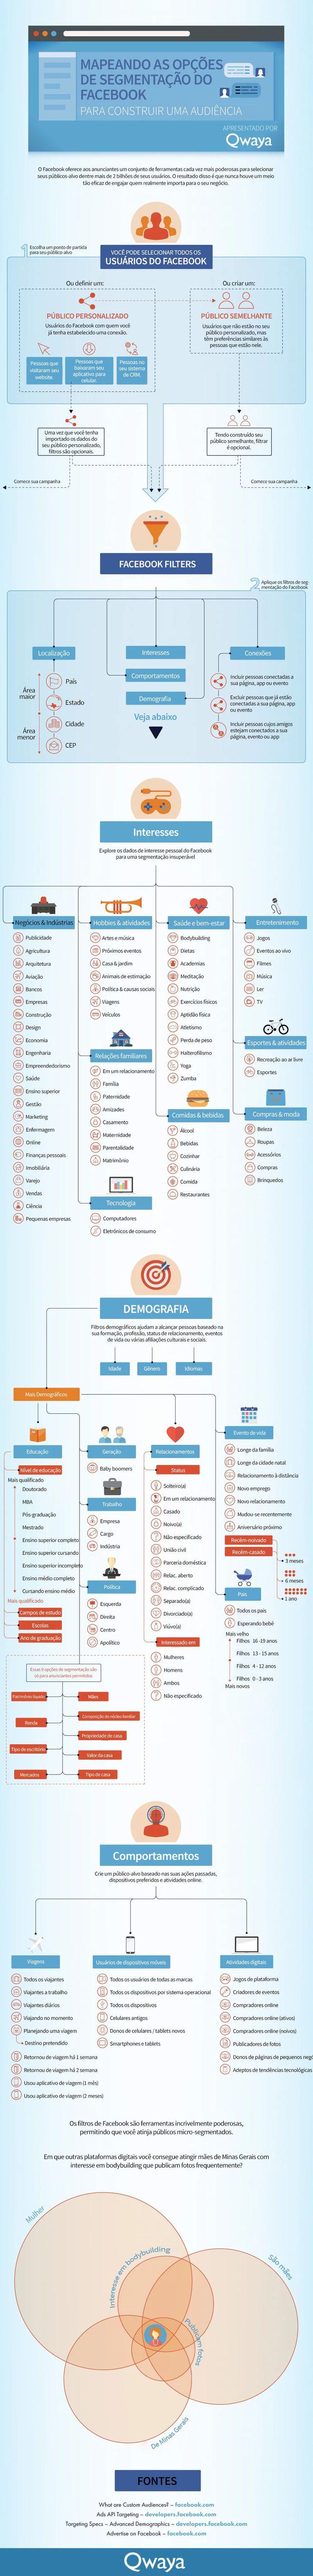 98 best infogrficos images on pinterest advertising business infogrfico como anunciar no facebook escolhendo o pblico ideal fandeluxe Images